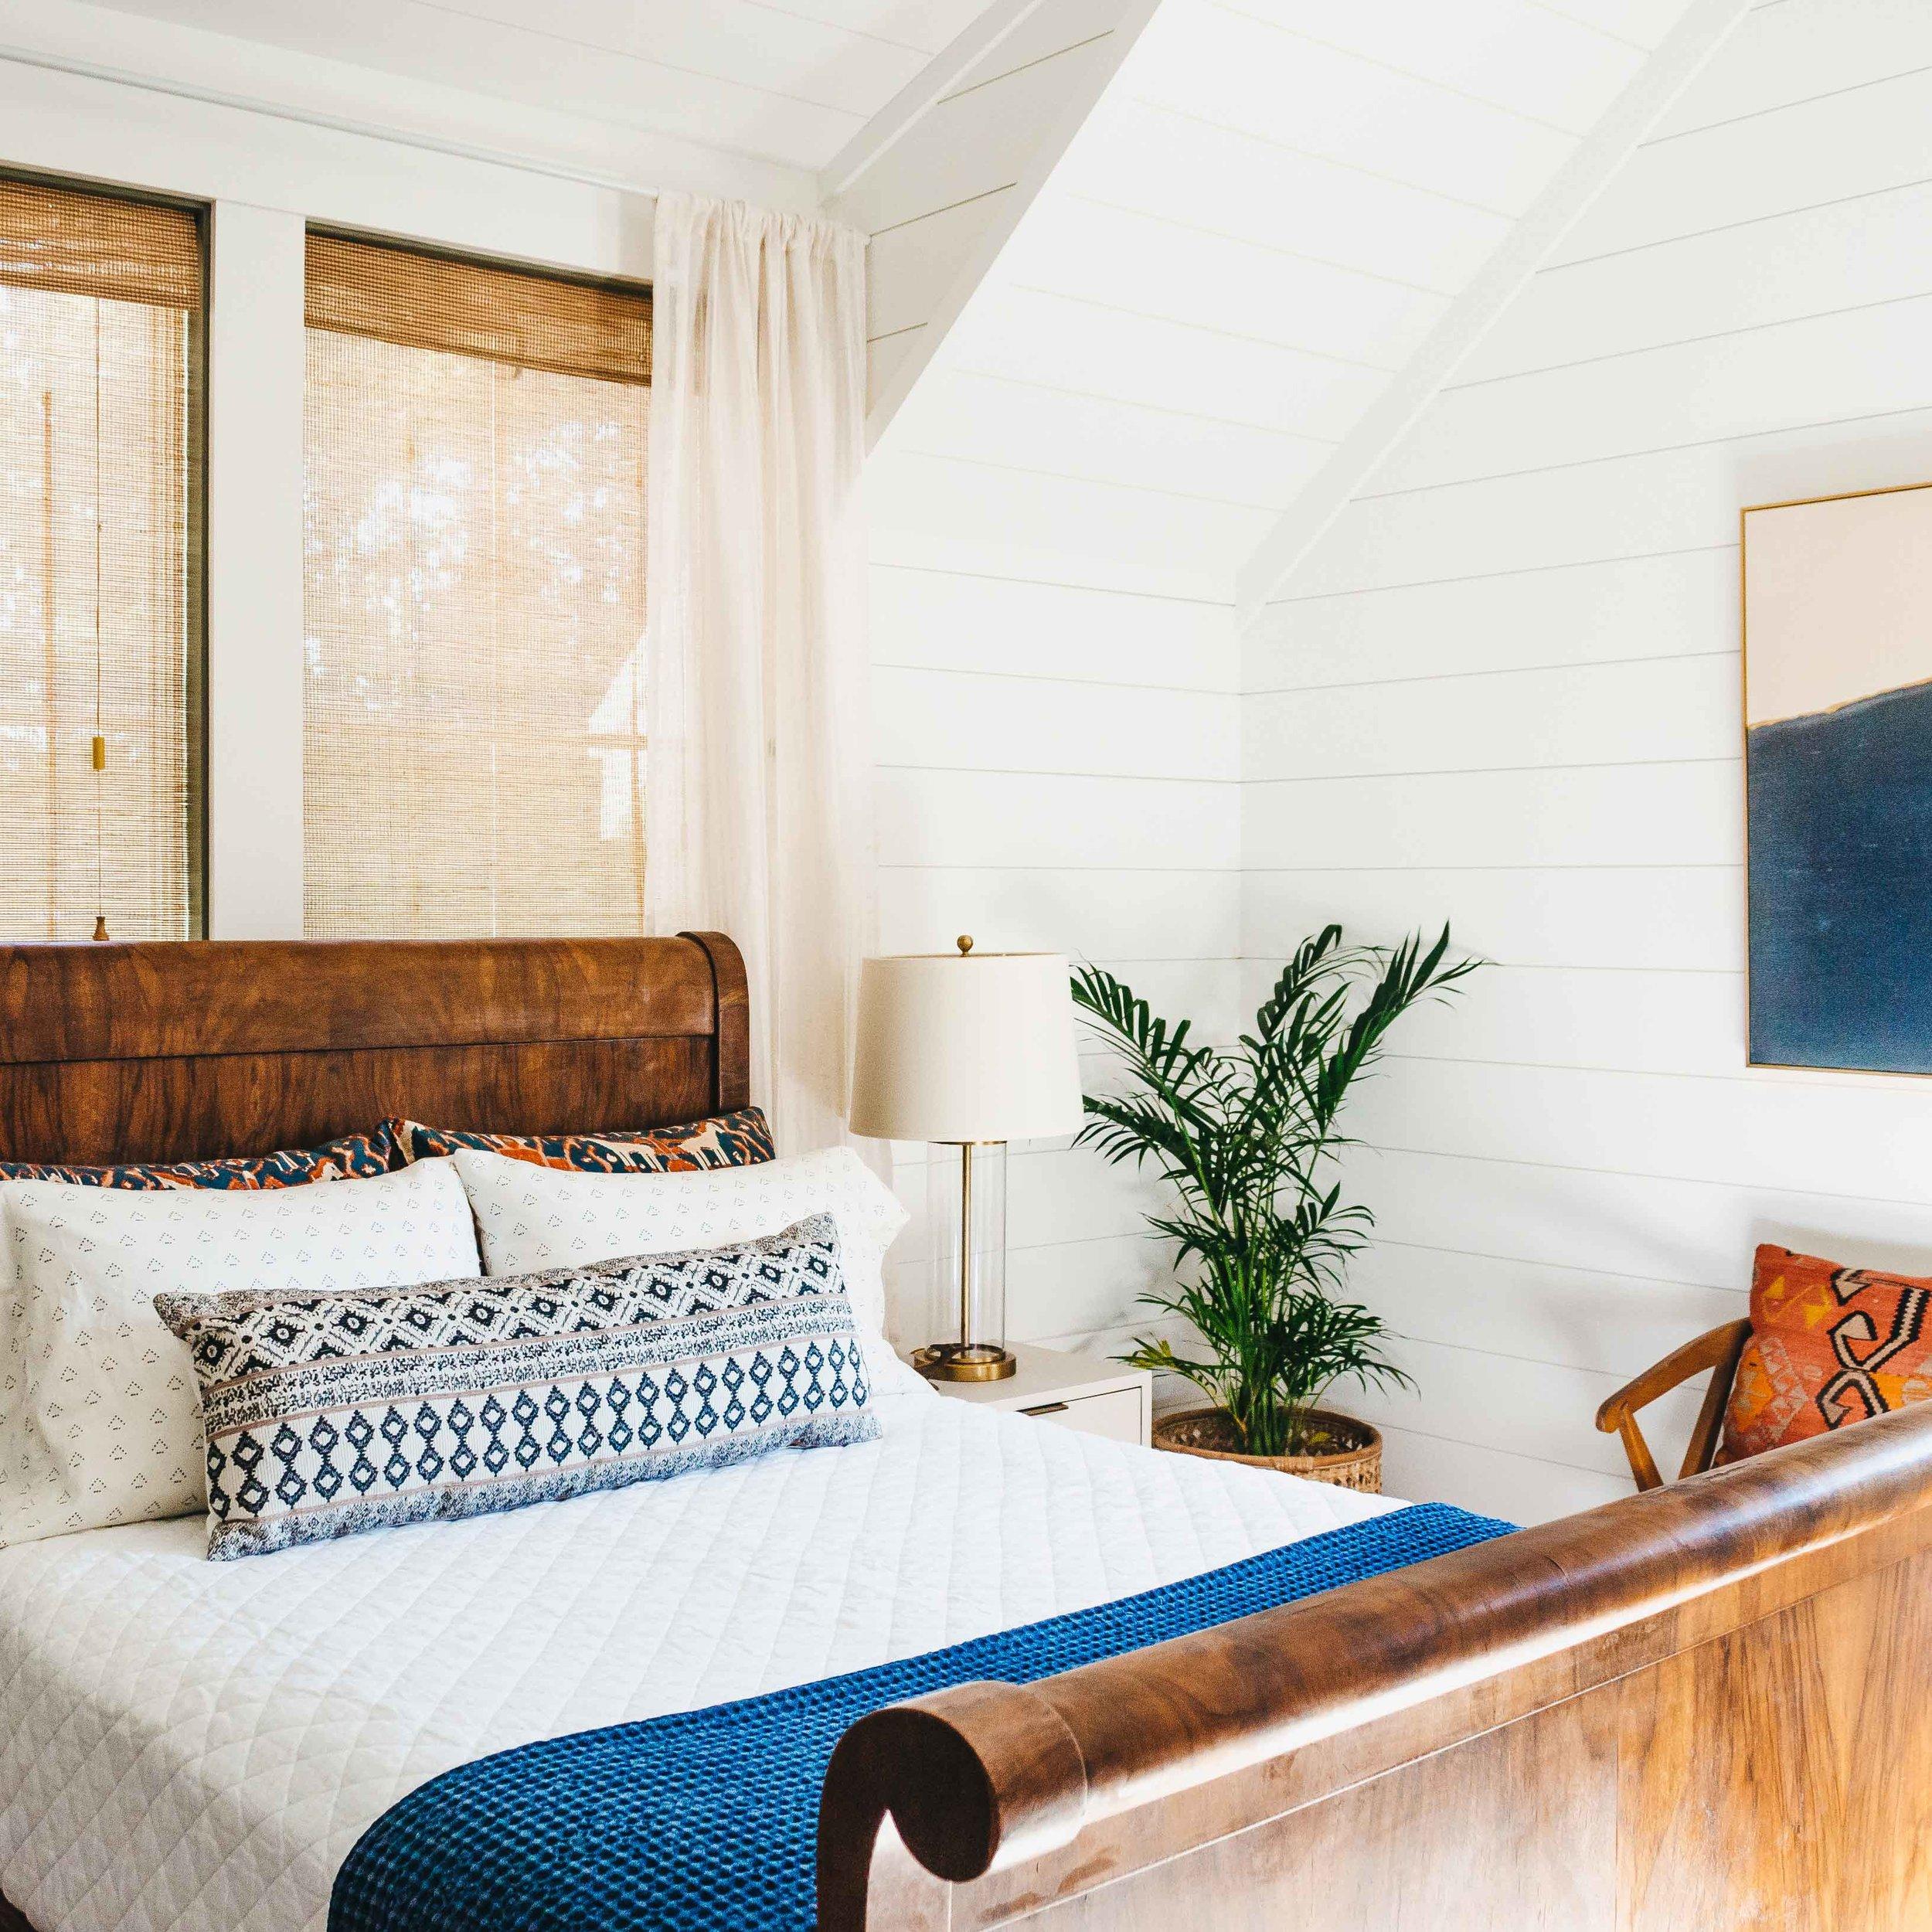 flourish-collaborative-interior-design-residential-hampton-carriage.jpg